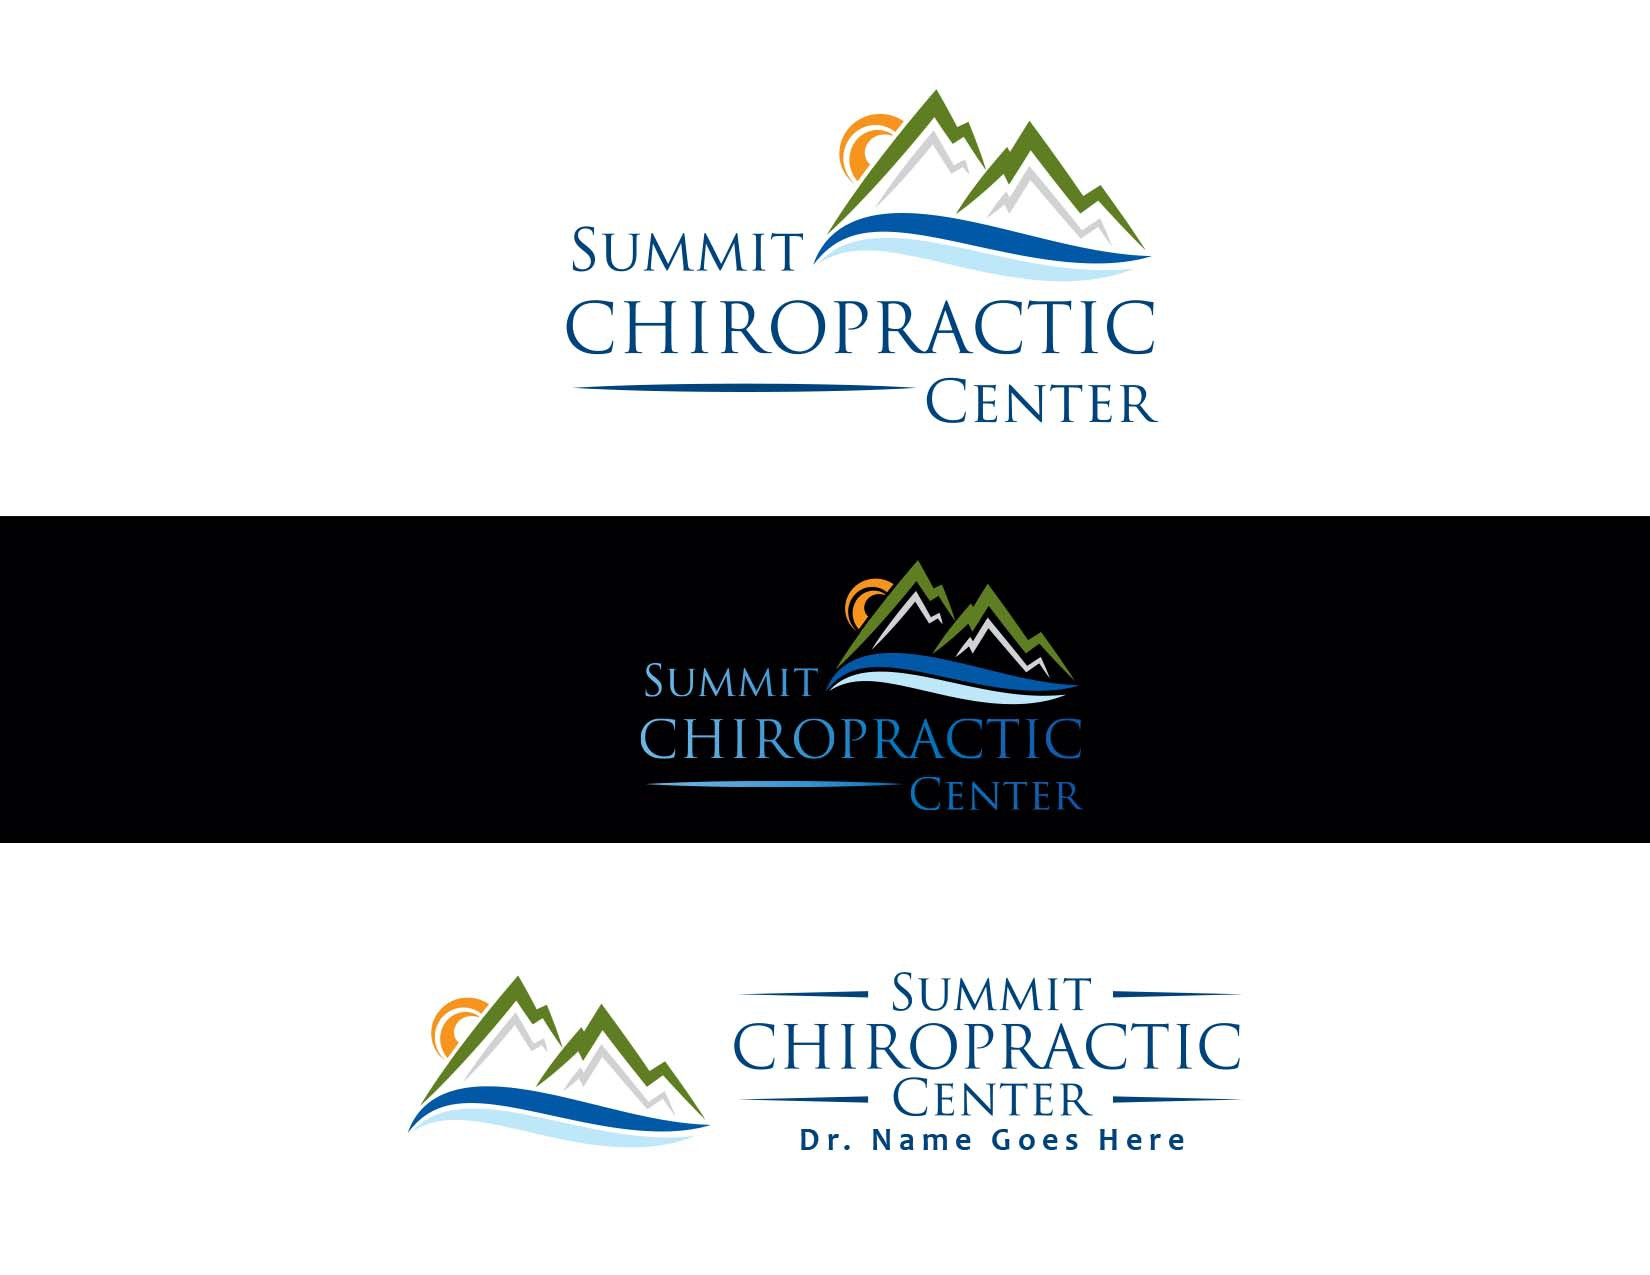 logo for Summit Chiropractic Center